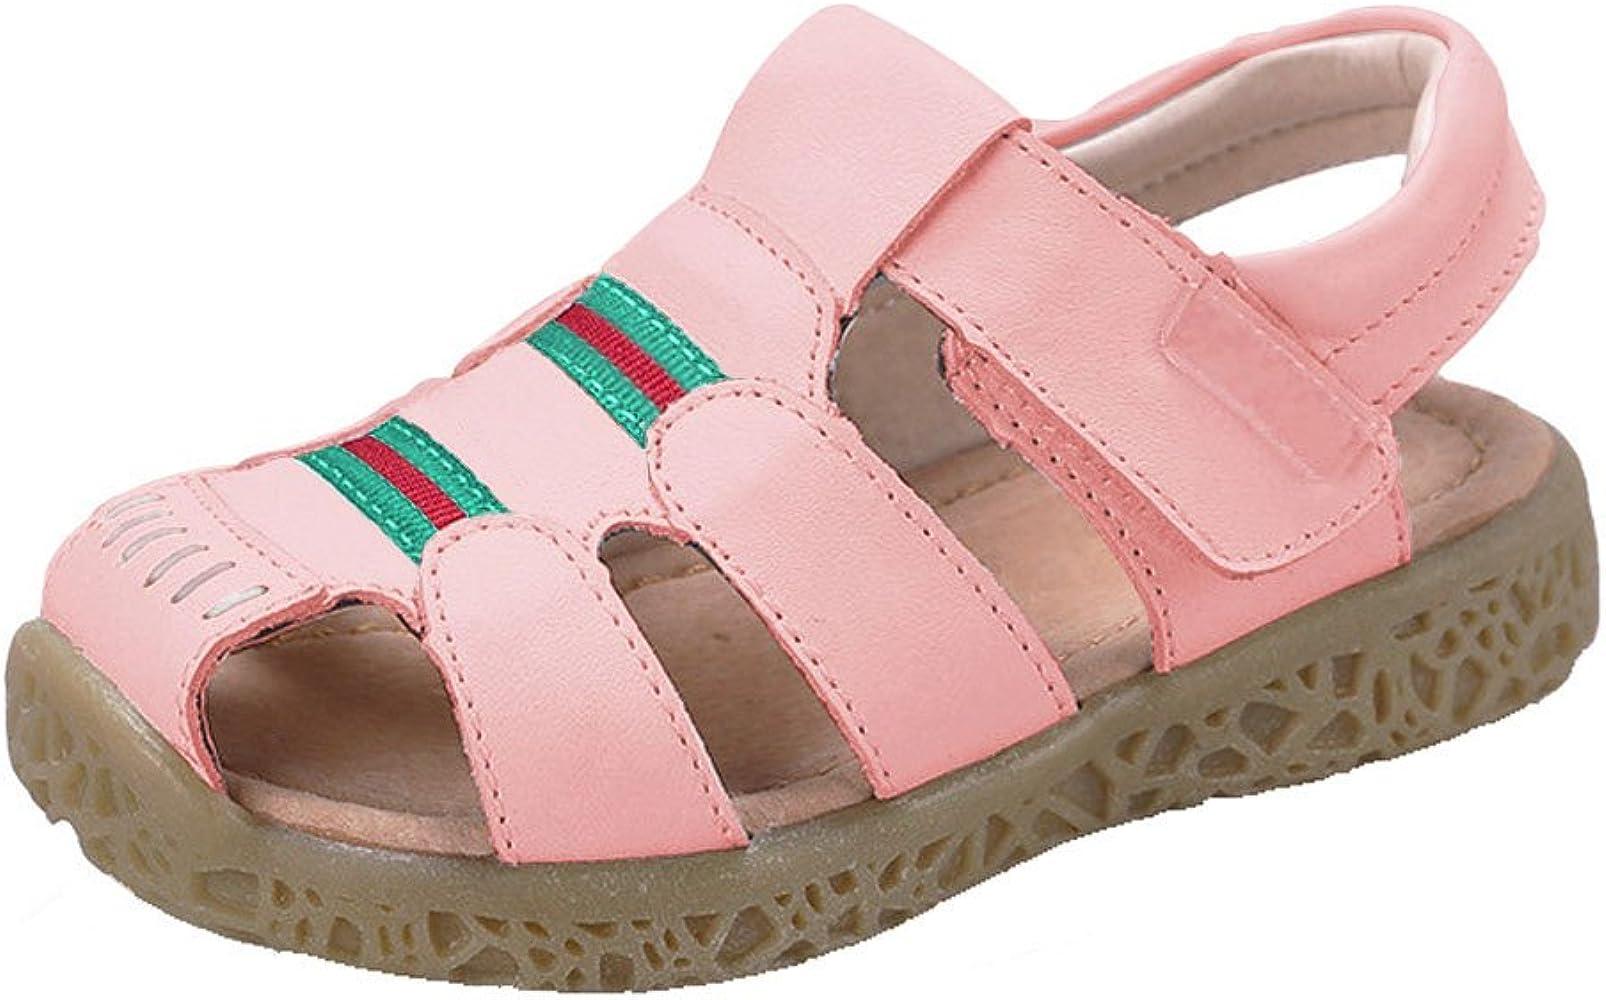 Toddler//Little Kid Durable Color : Blue+Beige , Size : 6.5 UK Non-Slip Boys Shoes Double Adjustable Strap Closed-Toe Sandals